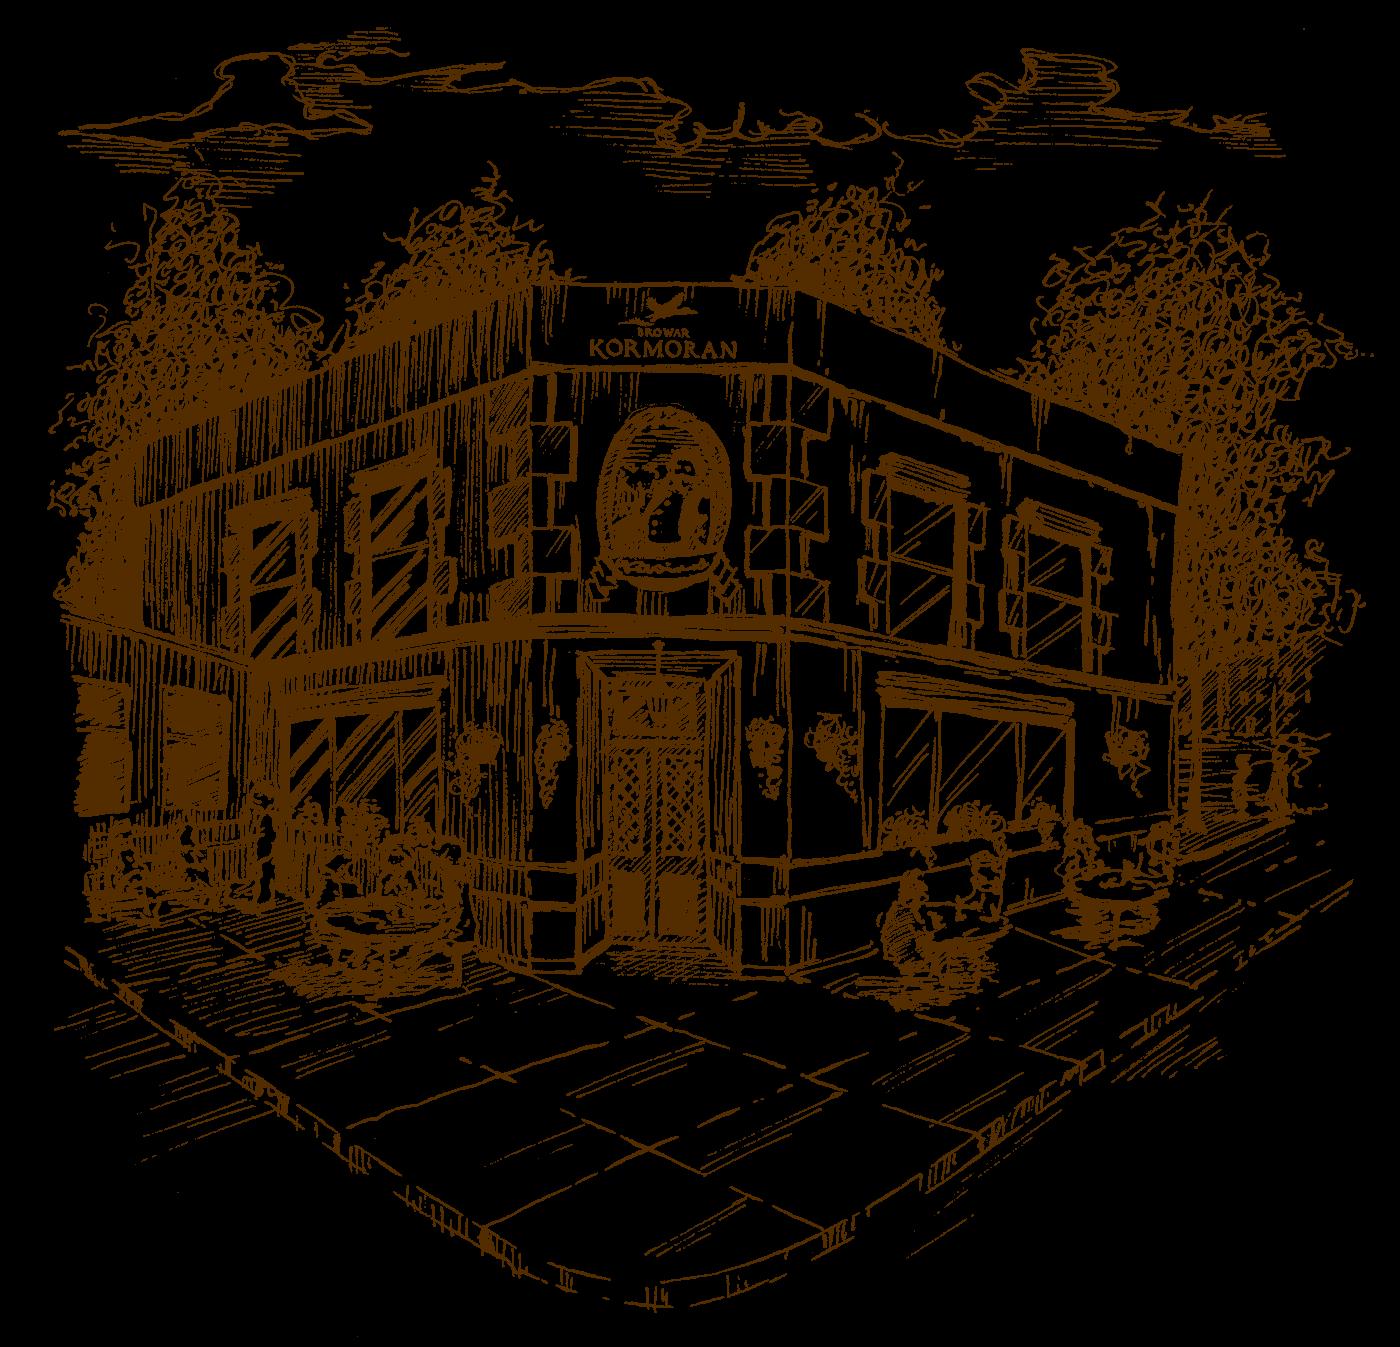 Browar Kormoran pub